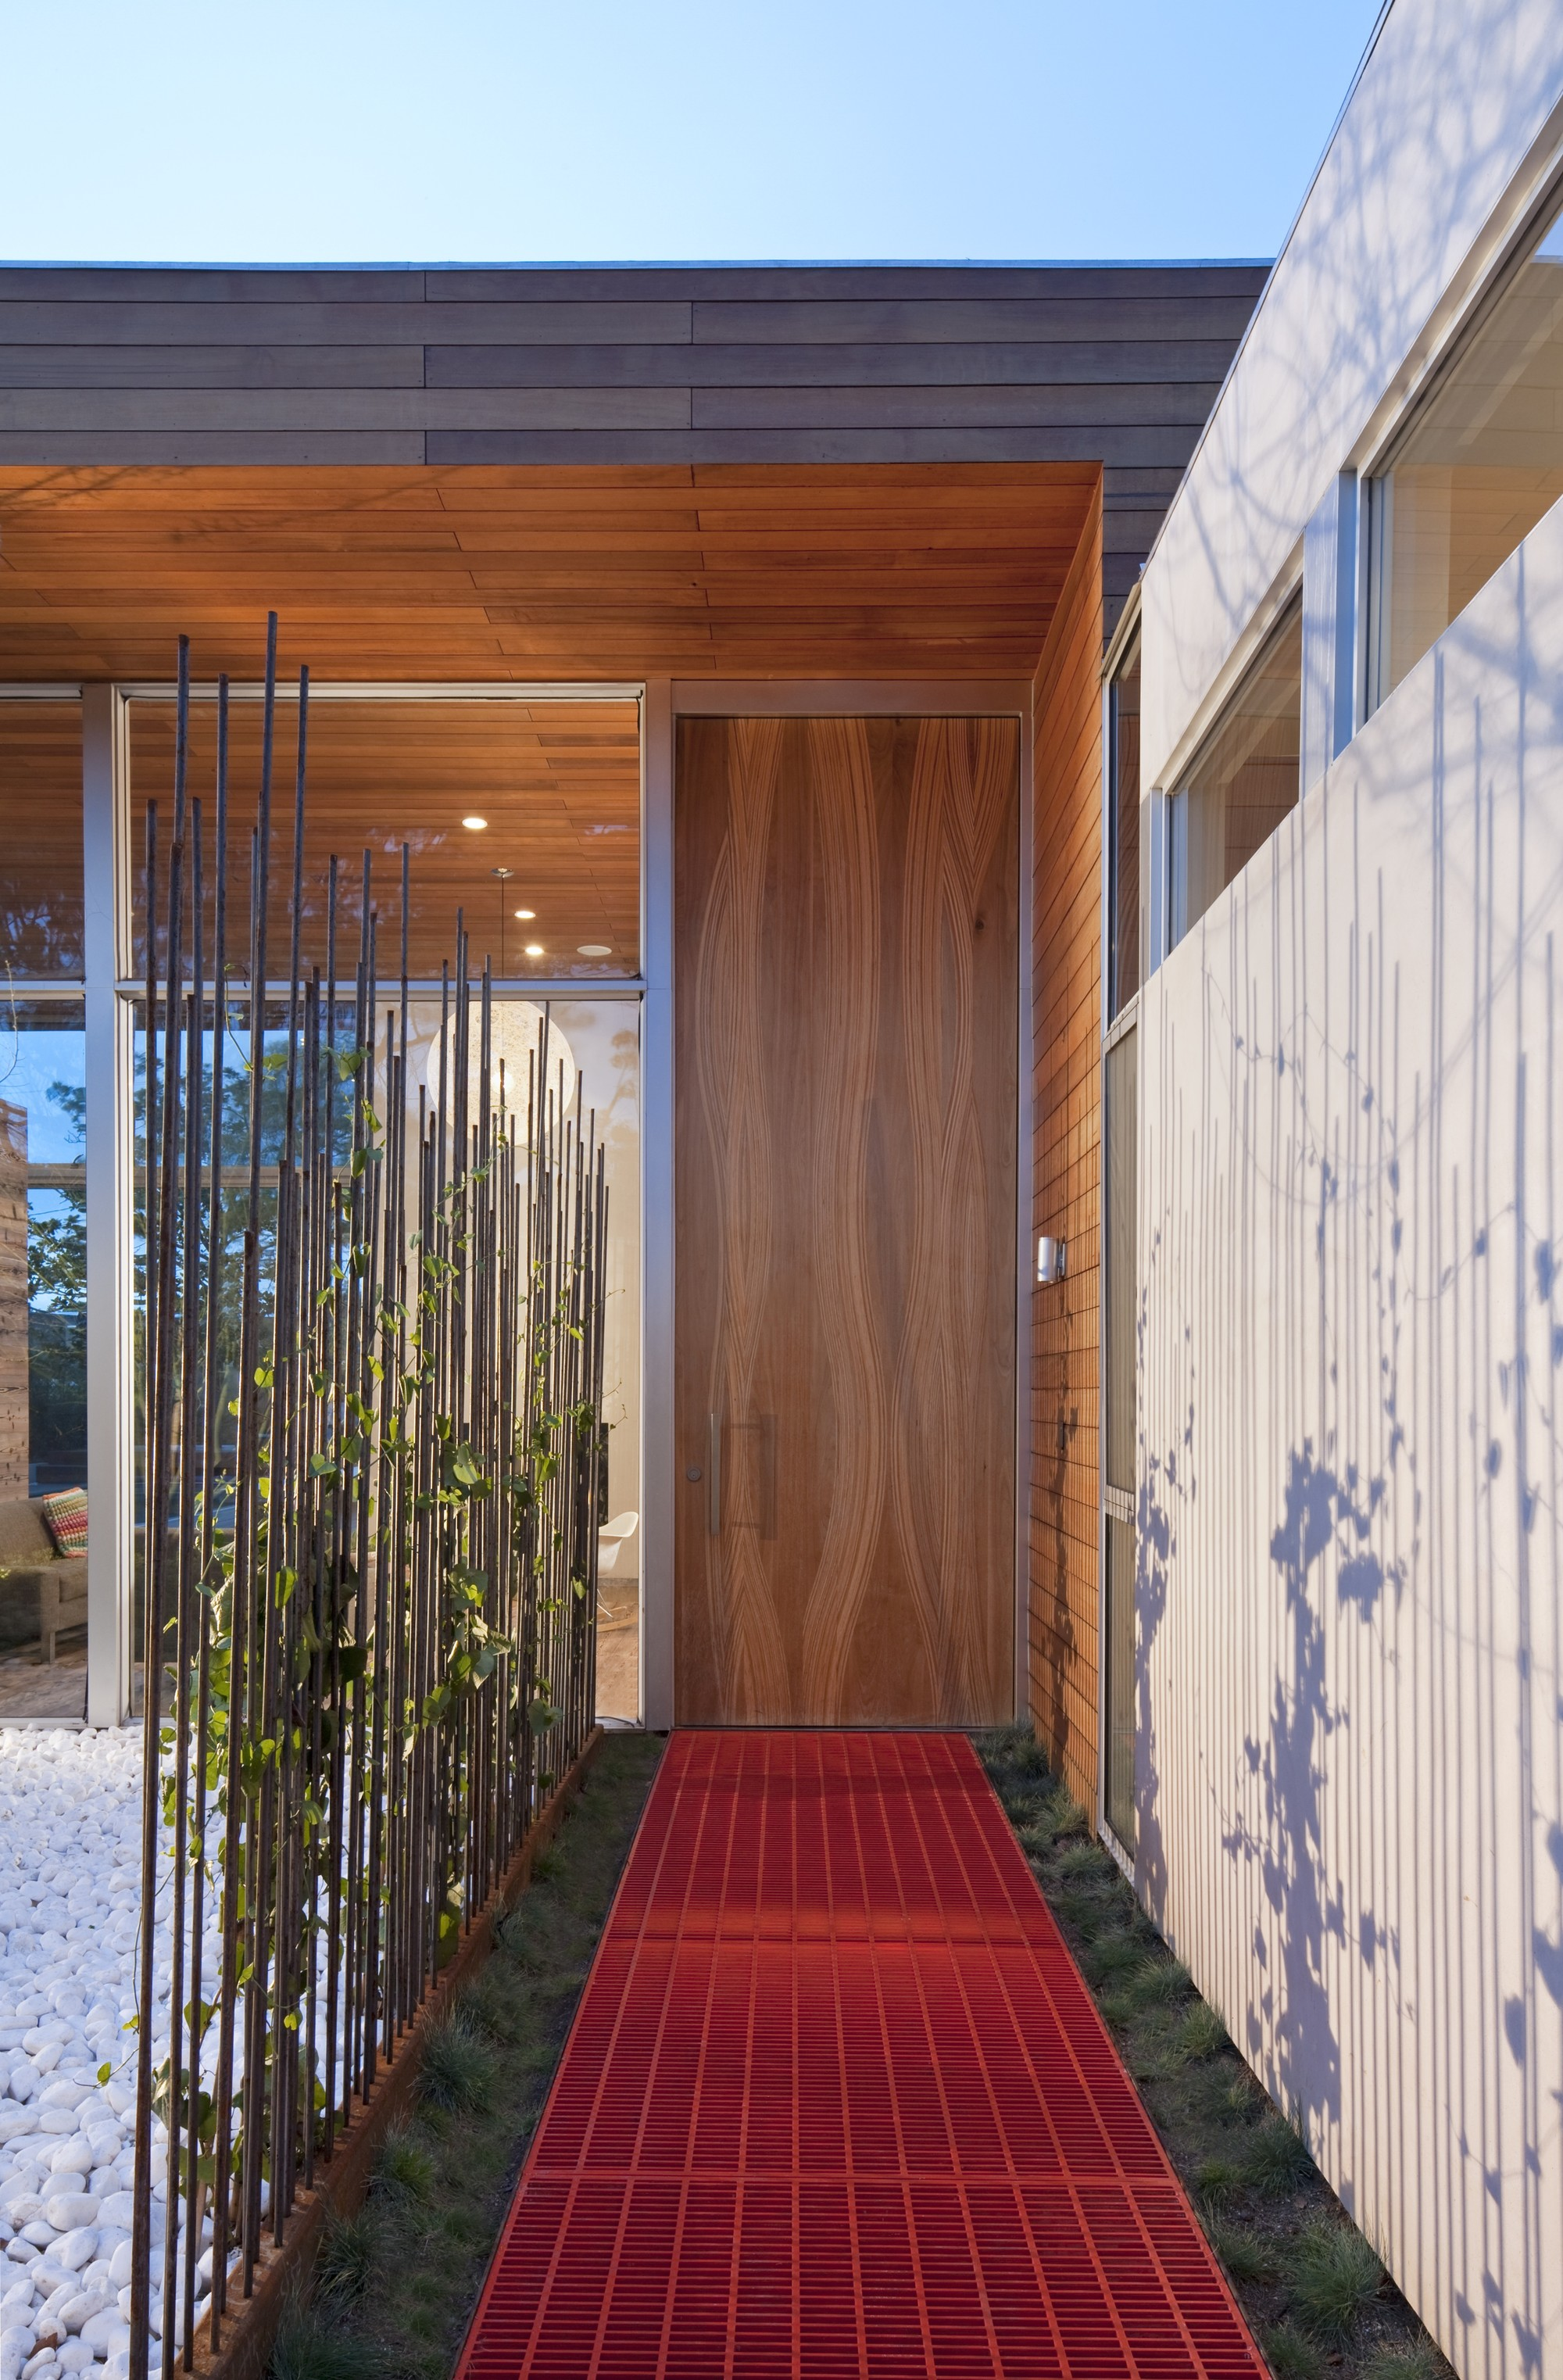 Galeria de appleton living minarc 9 - Idea casa biancheria mestre ...